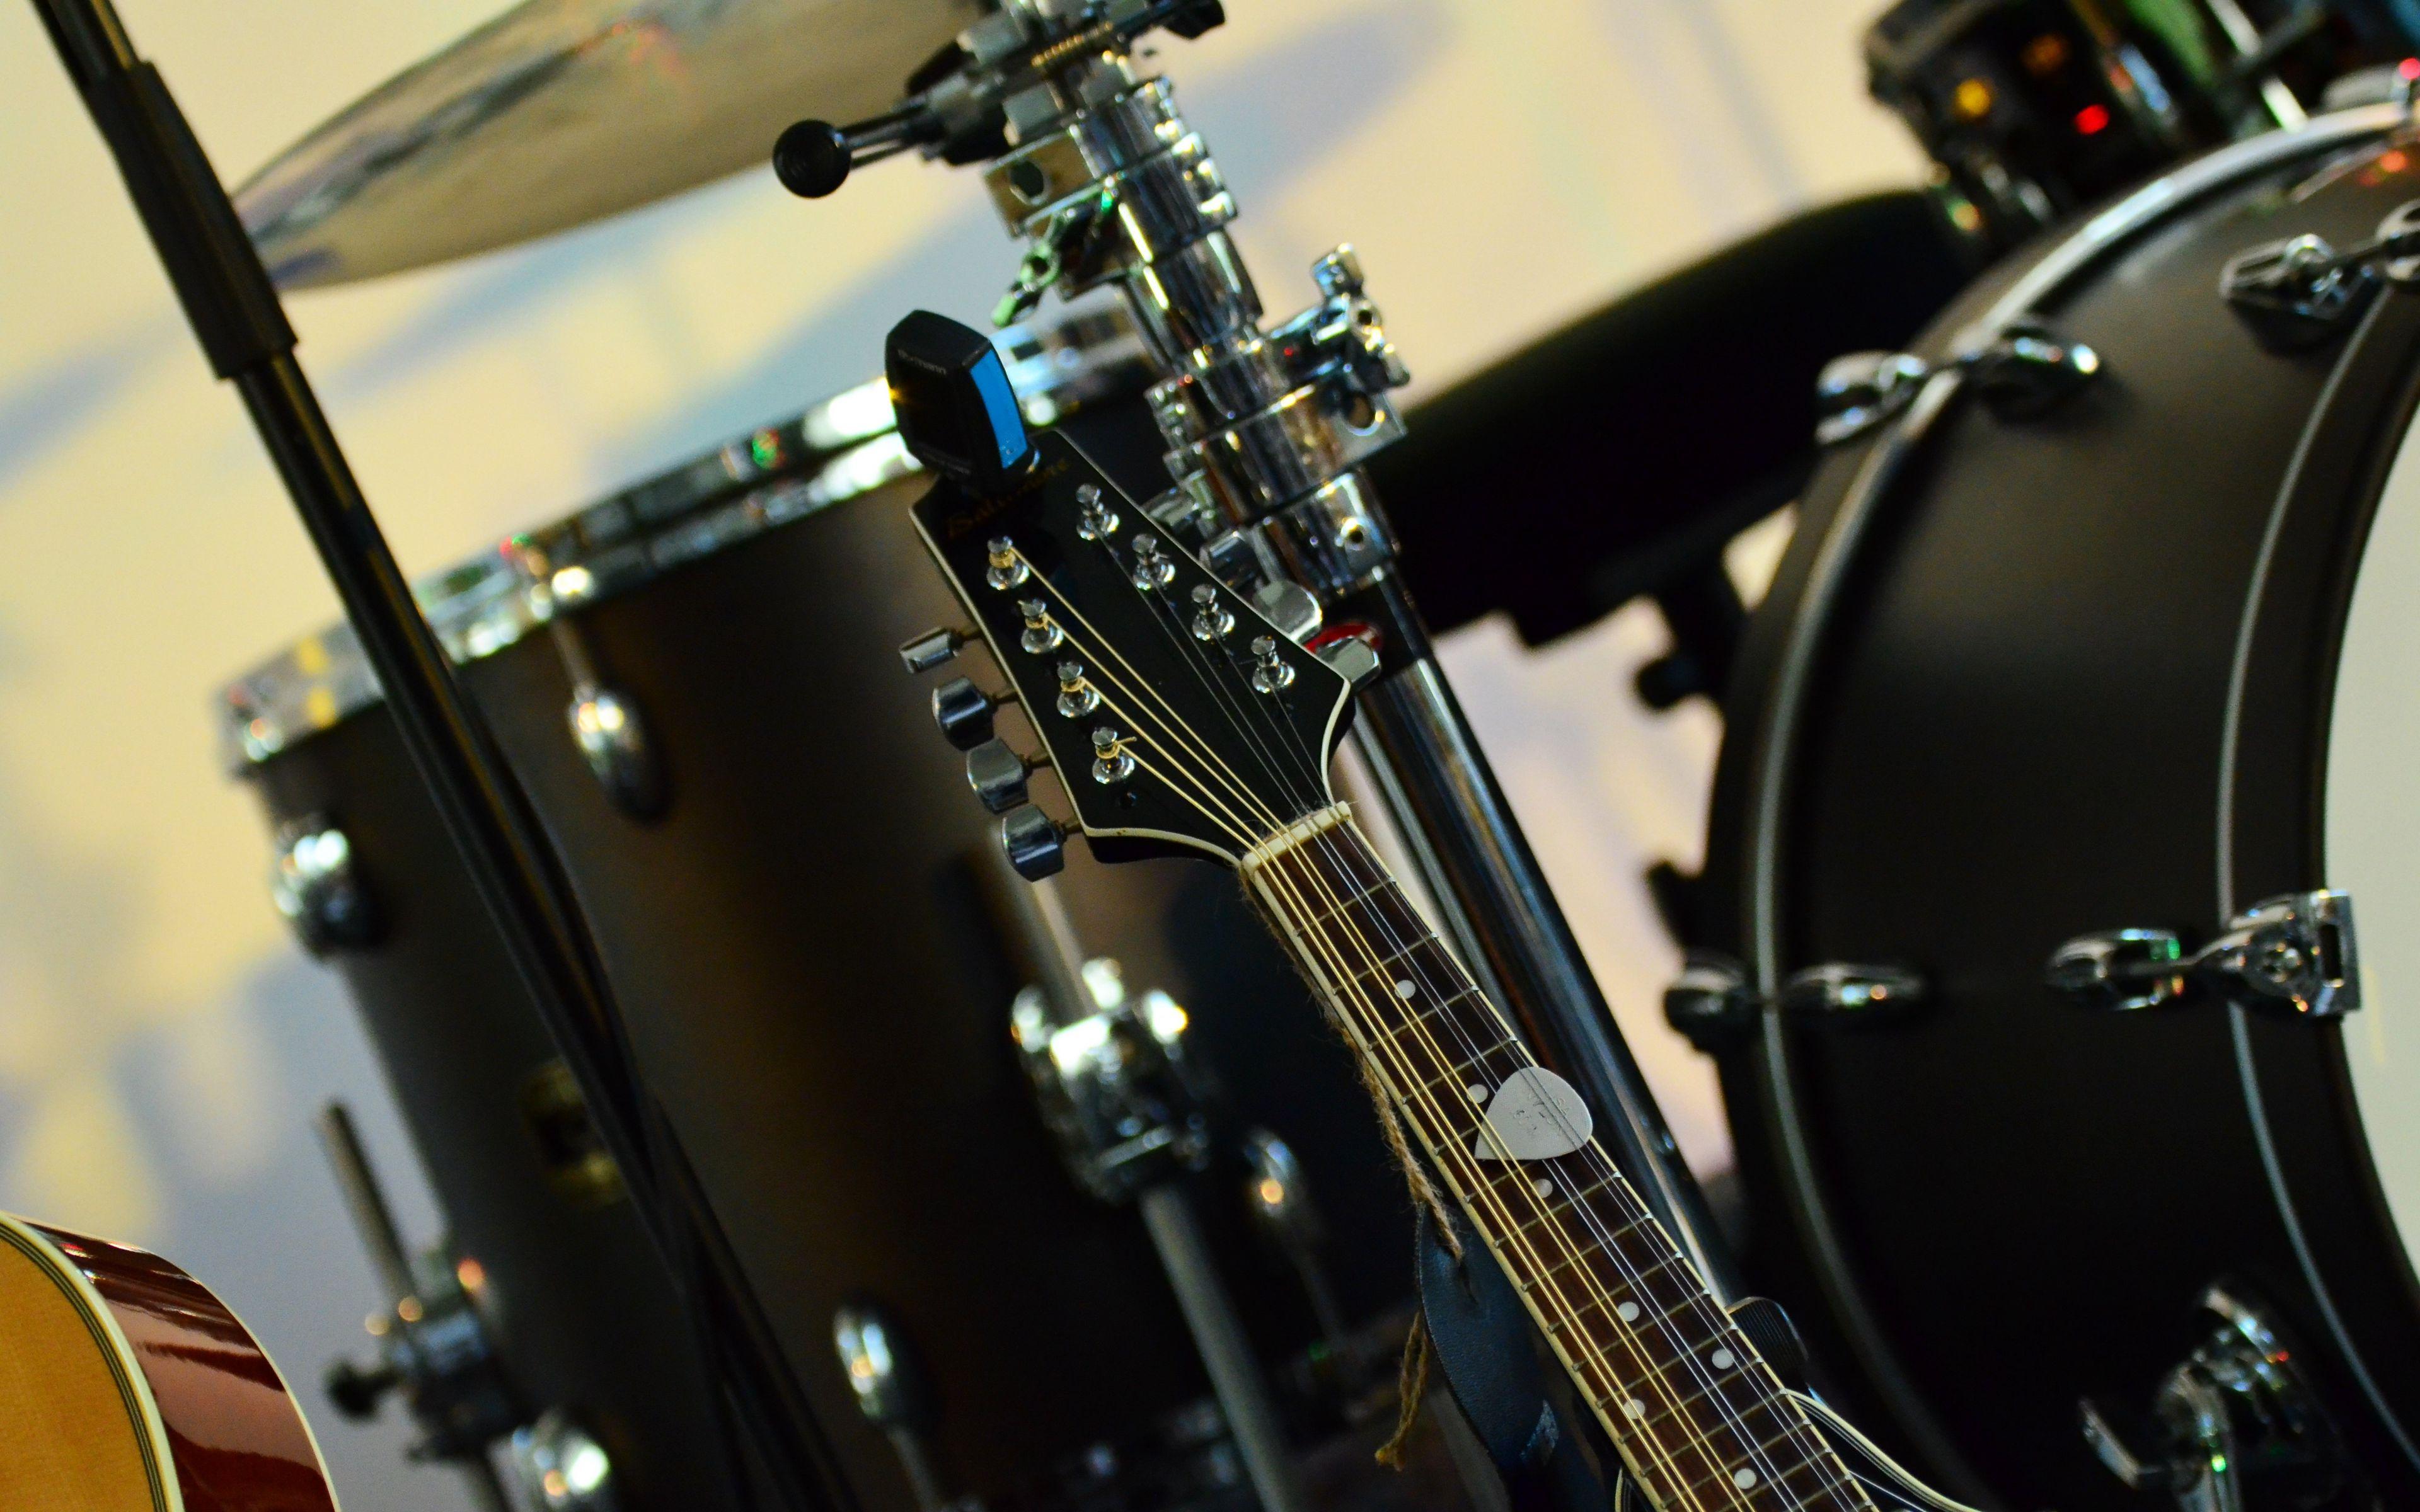 3840x2400 Wallpaper musical instrument, music, percussion, guitar